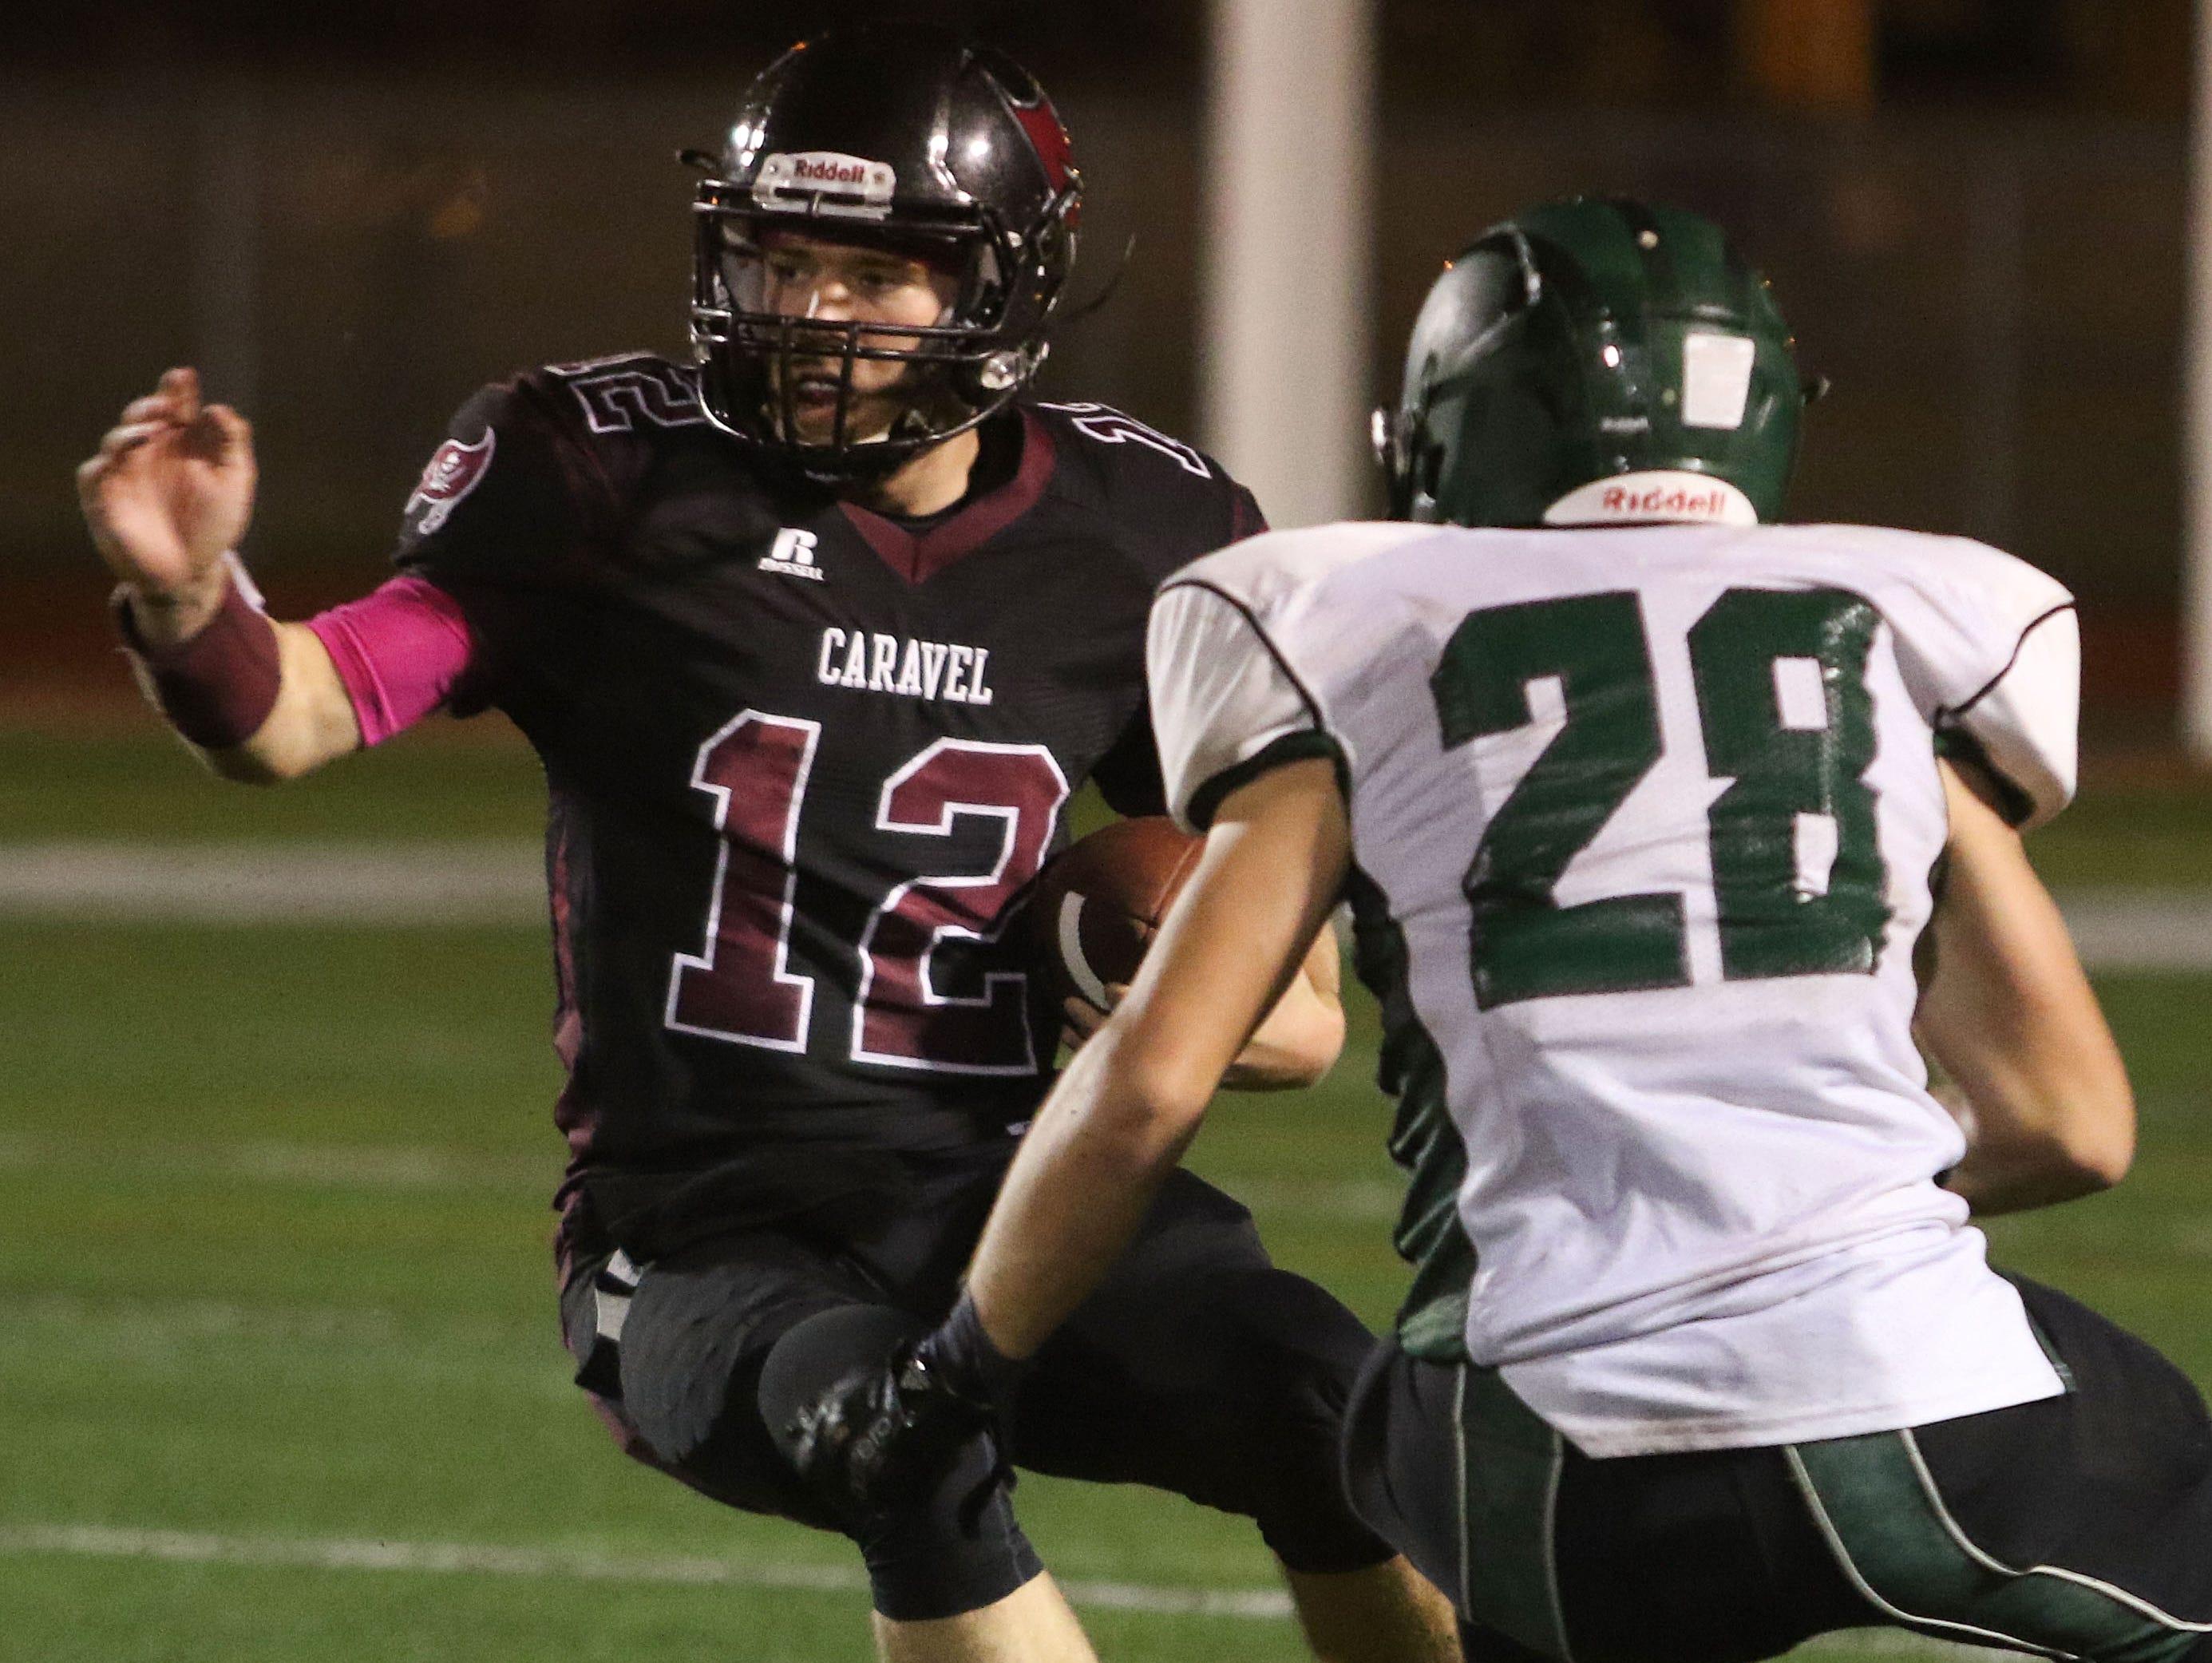 Caravel quarterback Jackson Argoe tries to cut back to avoid Archmere senior cornerback Clay Troy.